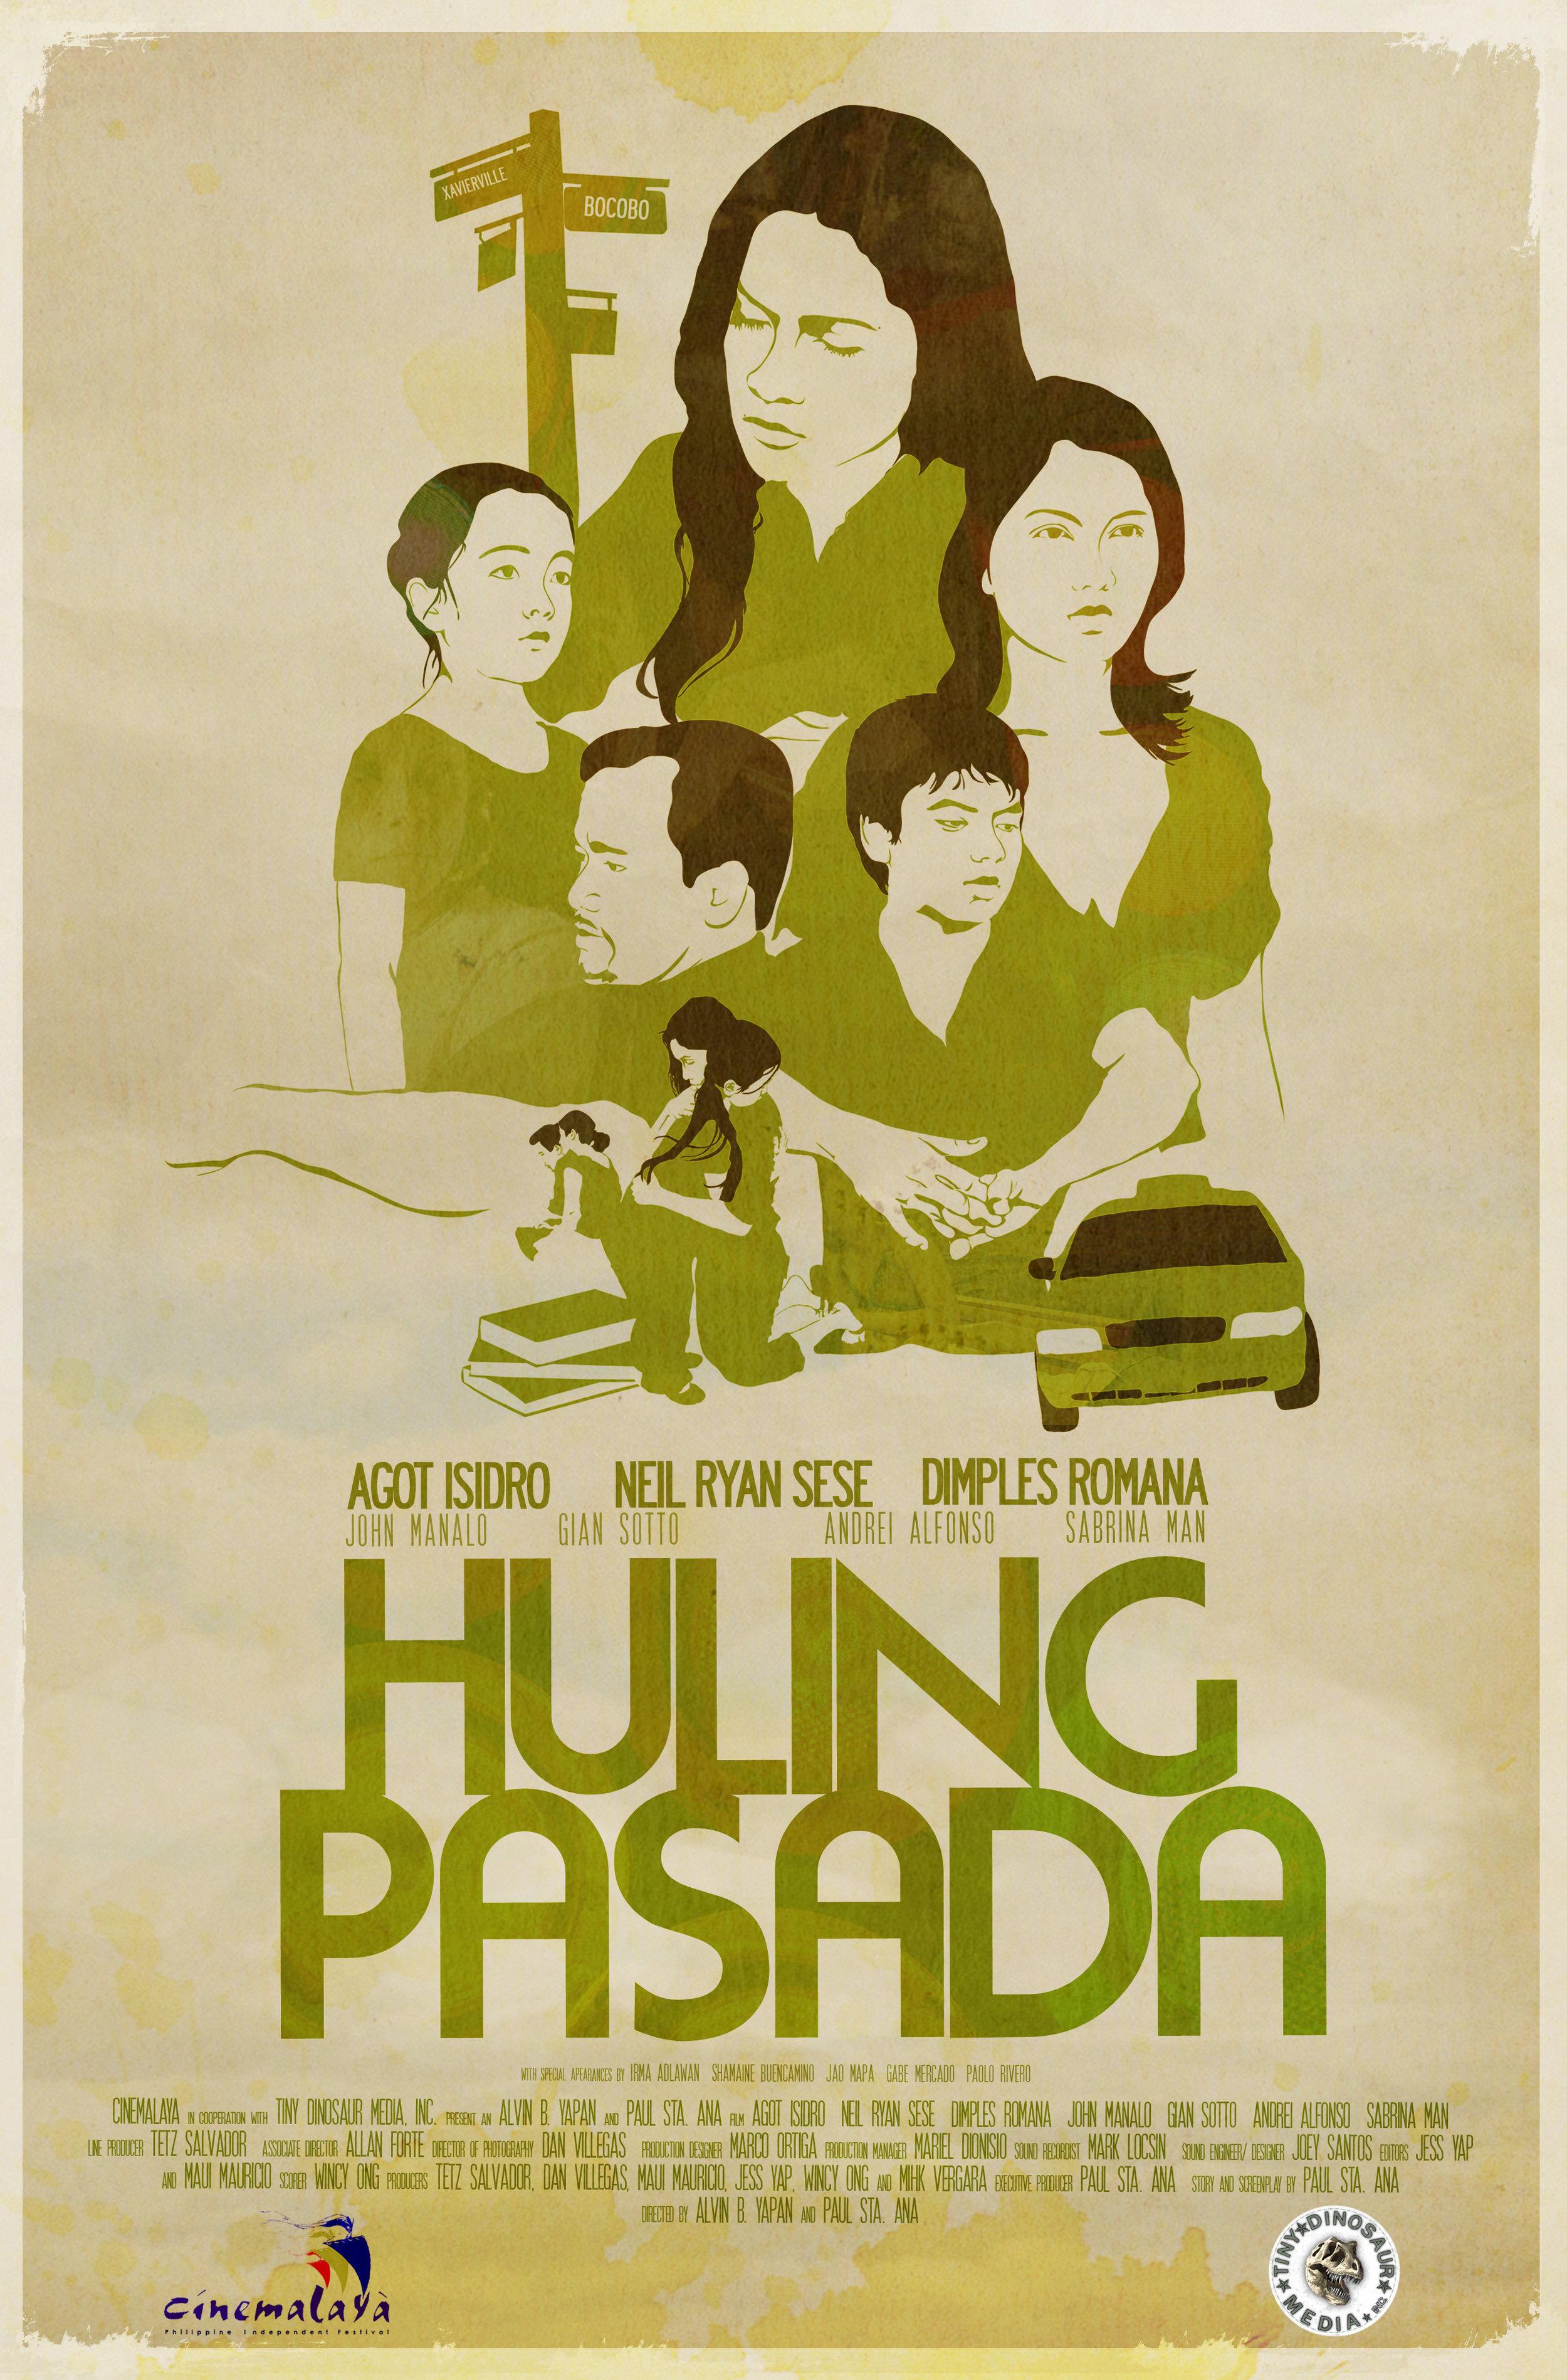 film poster graphic design company artist studio illustration green grunge car faces old paper metro manila philippines